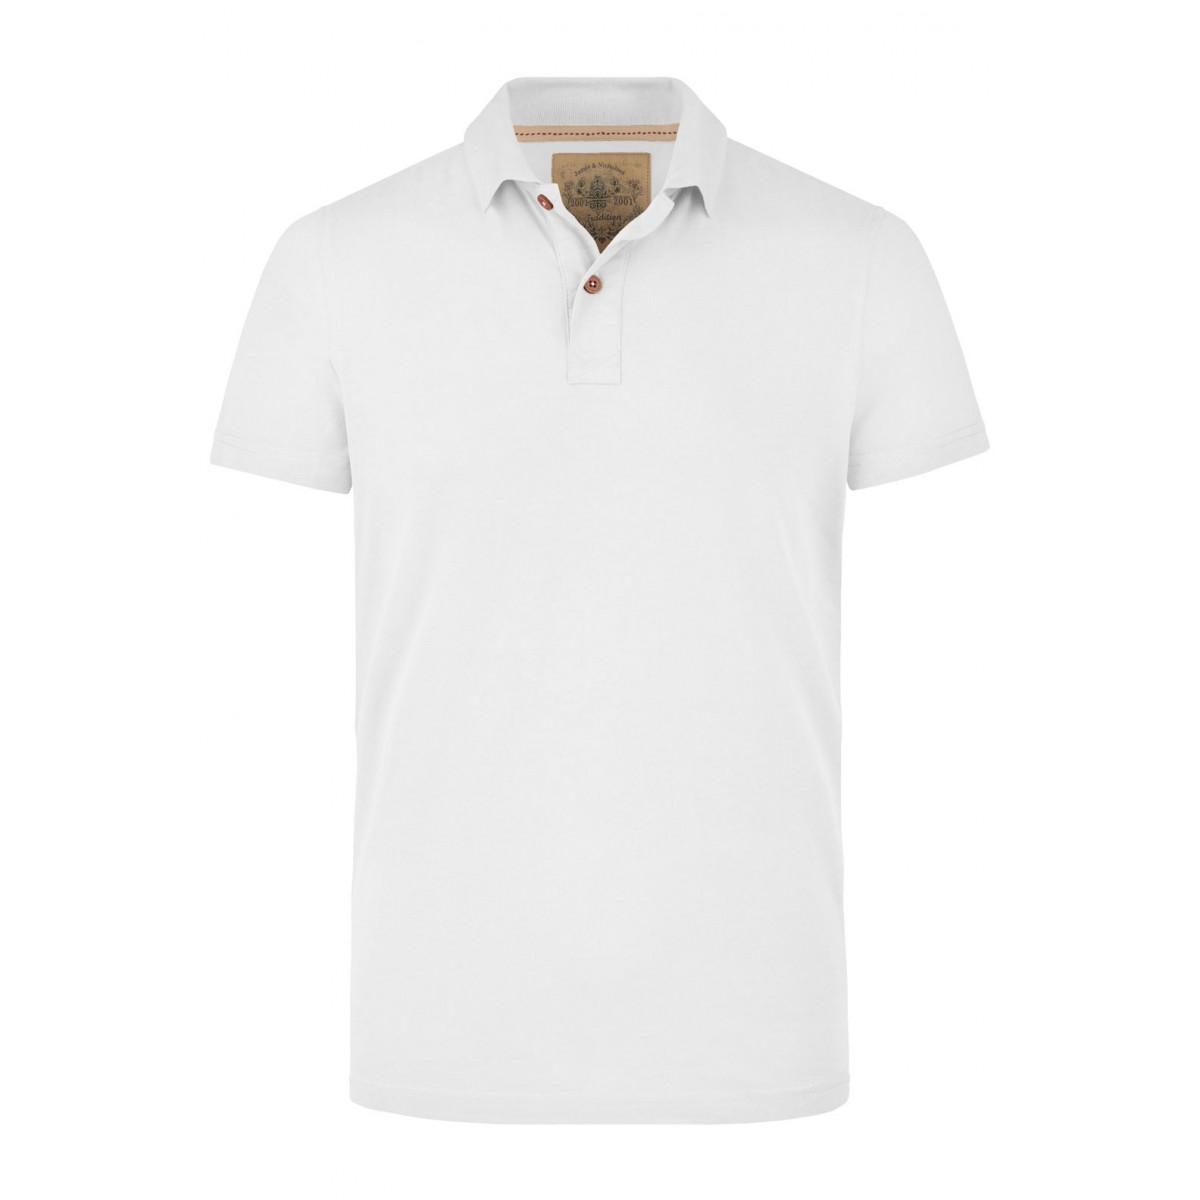 Рубашка поло мужская JN941 Mens Vintage Polo - Белый